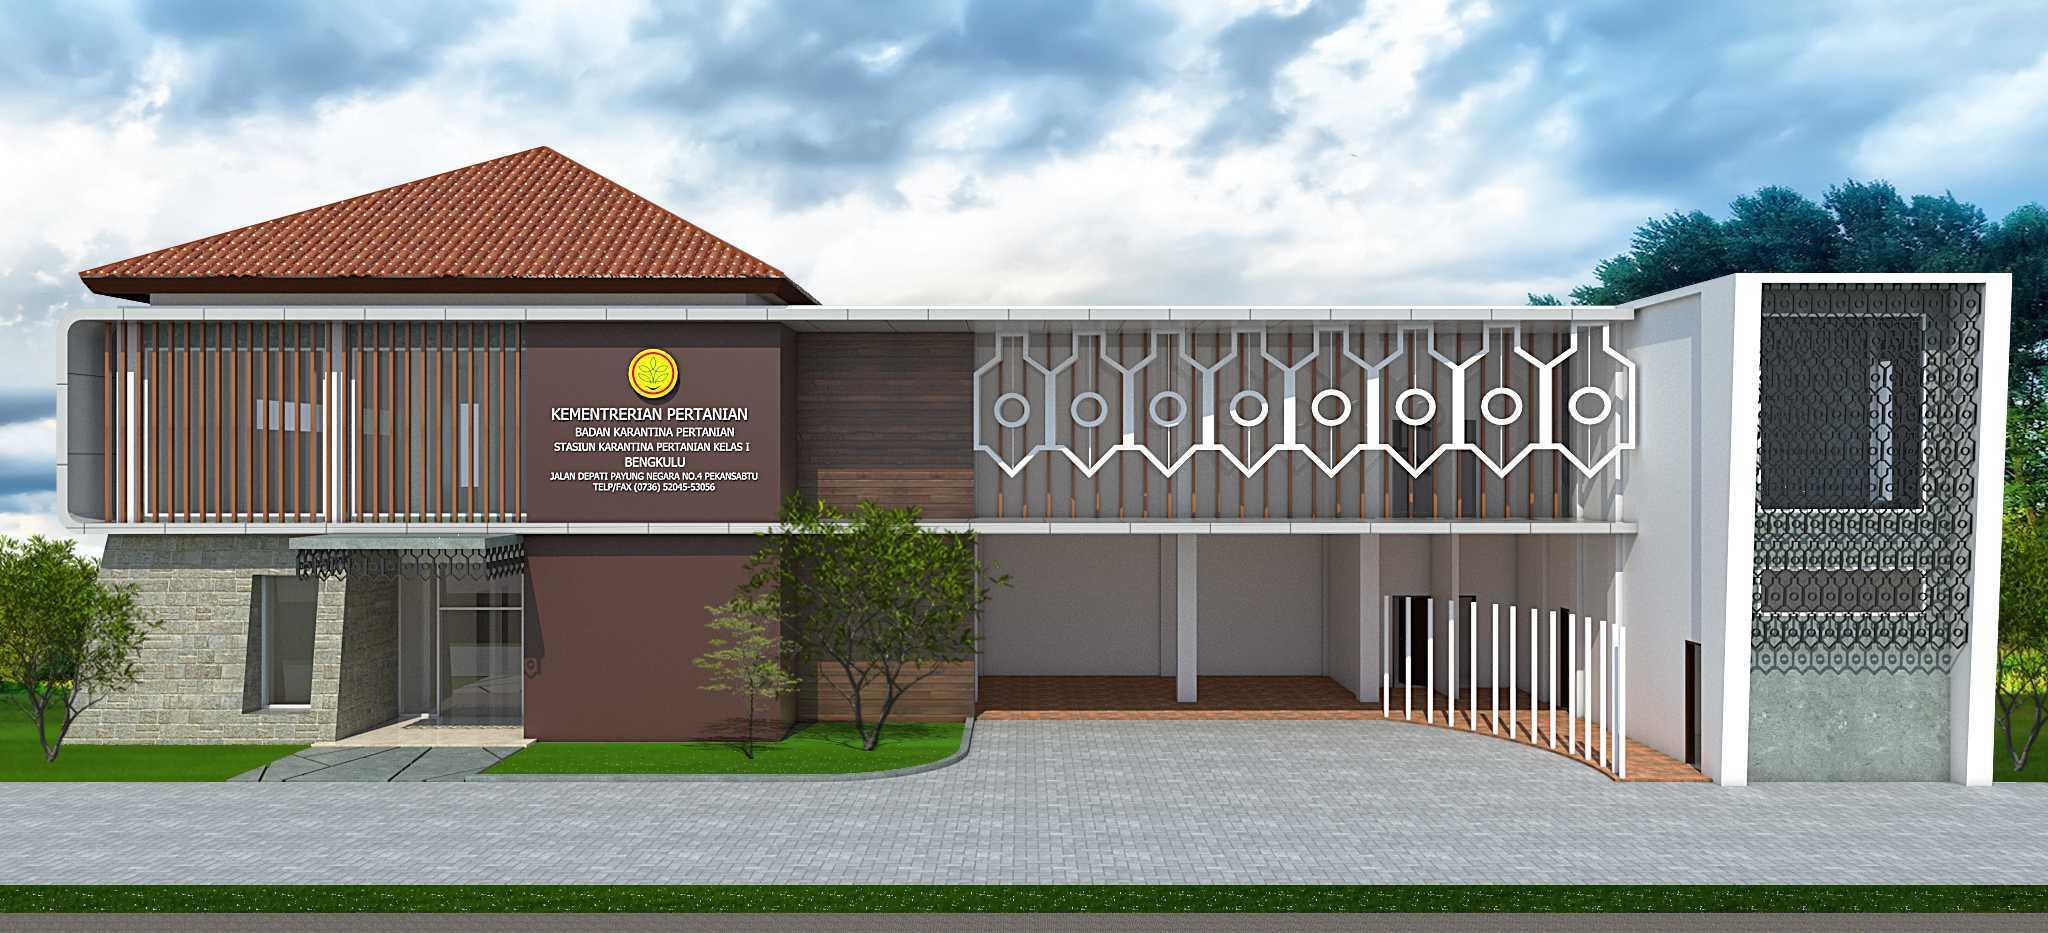 Studié By Ivan Eldo Kantor Kementerian Pertanian Bengkulu Bengkulu, Indonesia Bengkulu, Indonesia Ivan-Eldo-Kantor-Kementerian-Pertanian-Bengkulu  65317